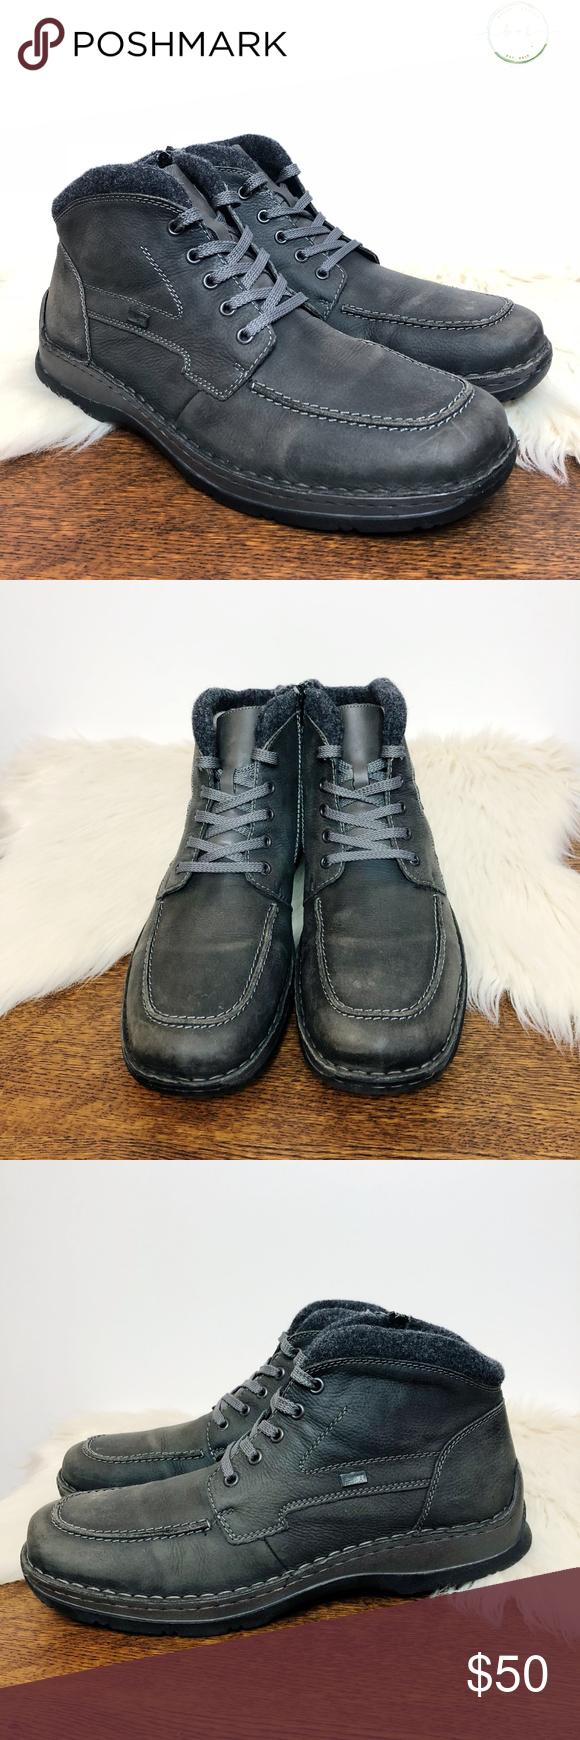 Rieker Tex Wool Lined Waterproof Boots Rieker Tex 32332 Gray